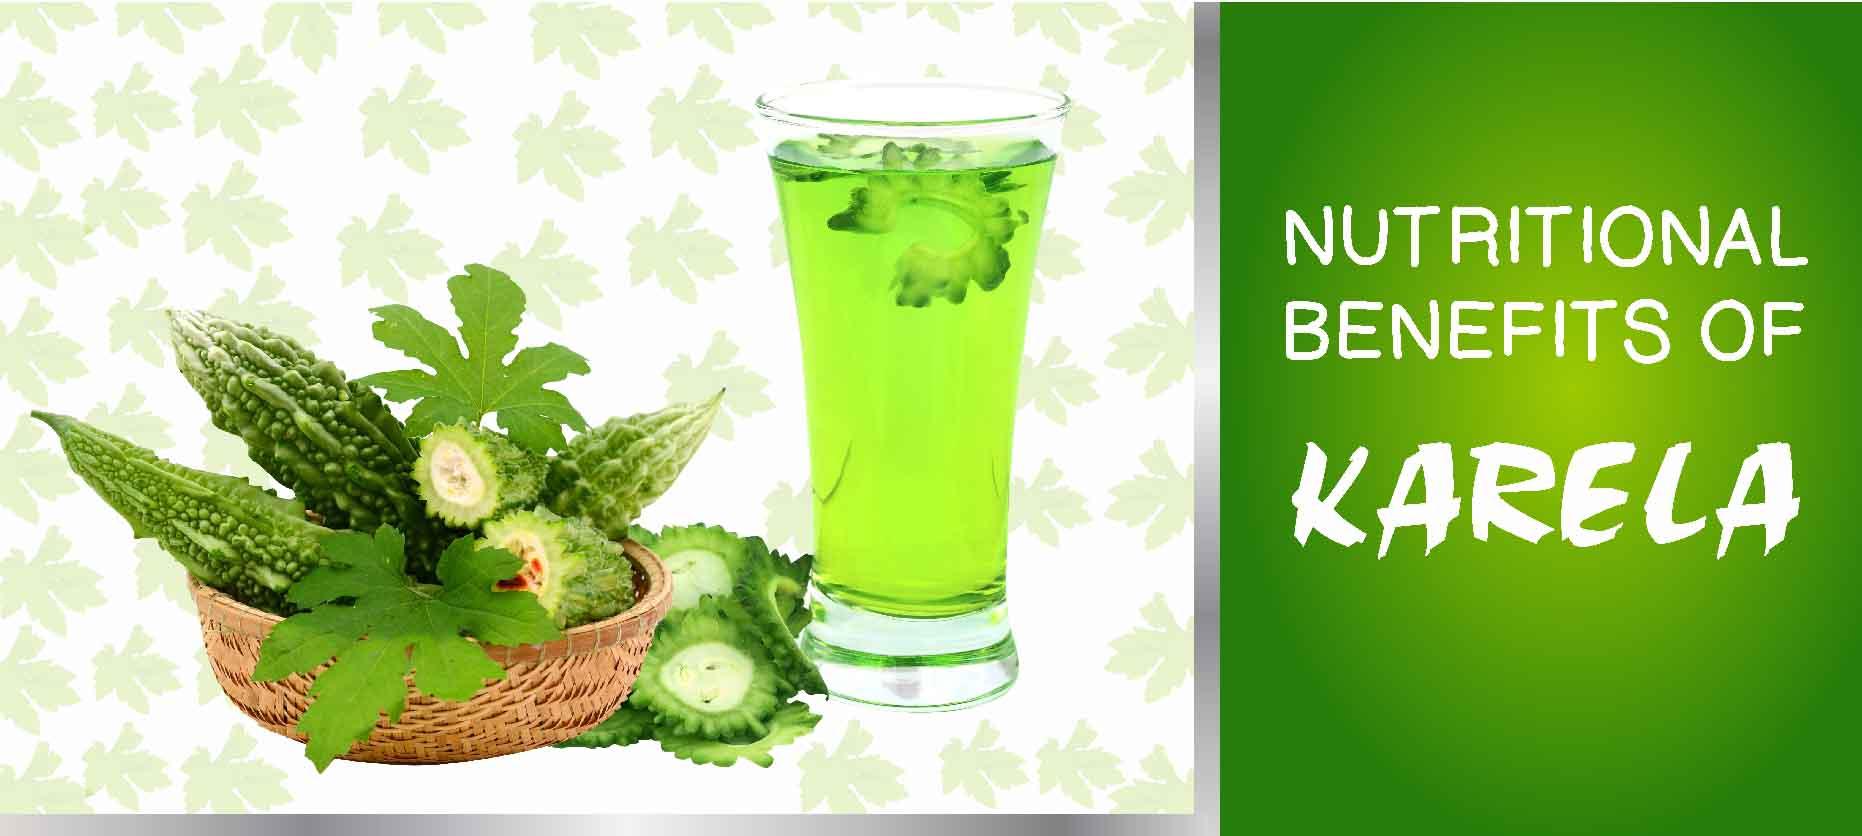 Nutritional Benefits of Karela